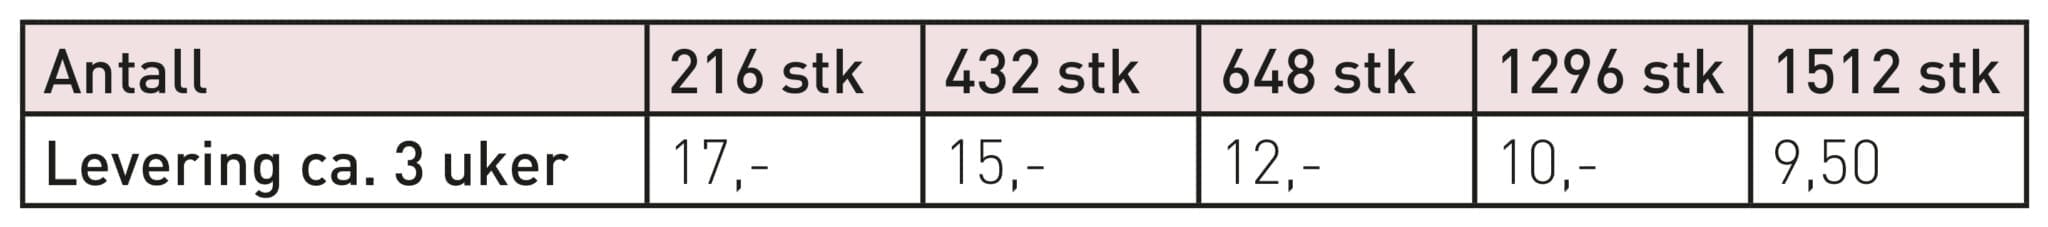 Pristabell for profilvann - Allprofil AS - Trykksaker - Profilering - Klær - Digital skilting - Tjenester - Kontakt